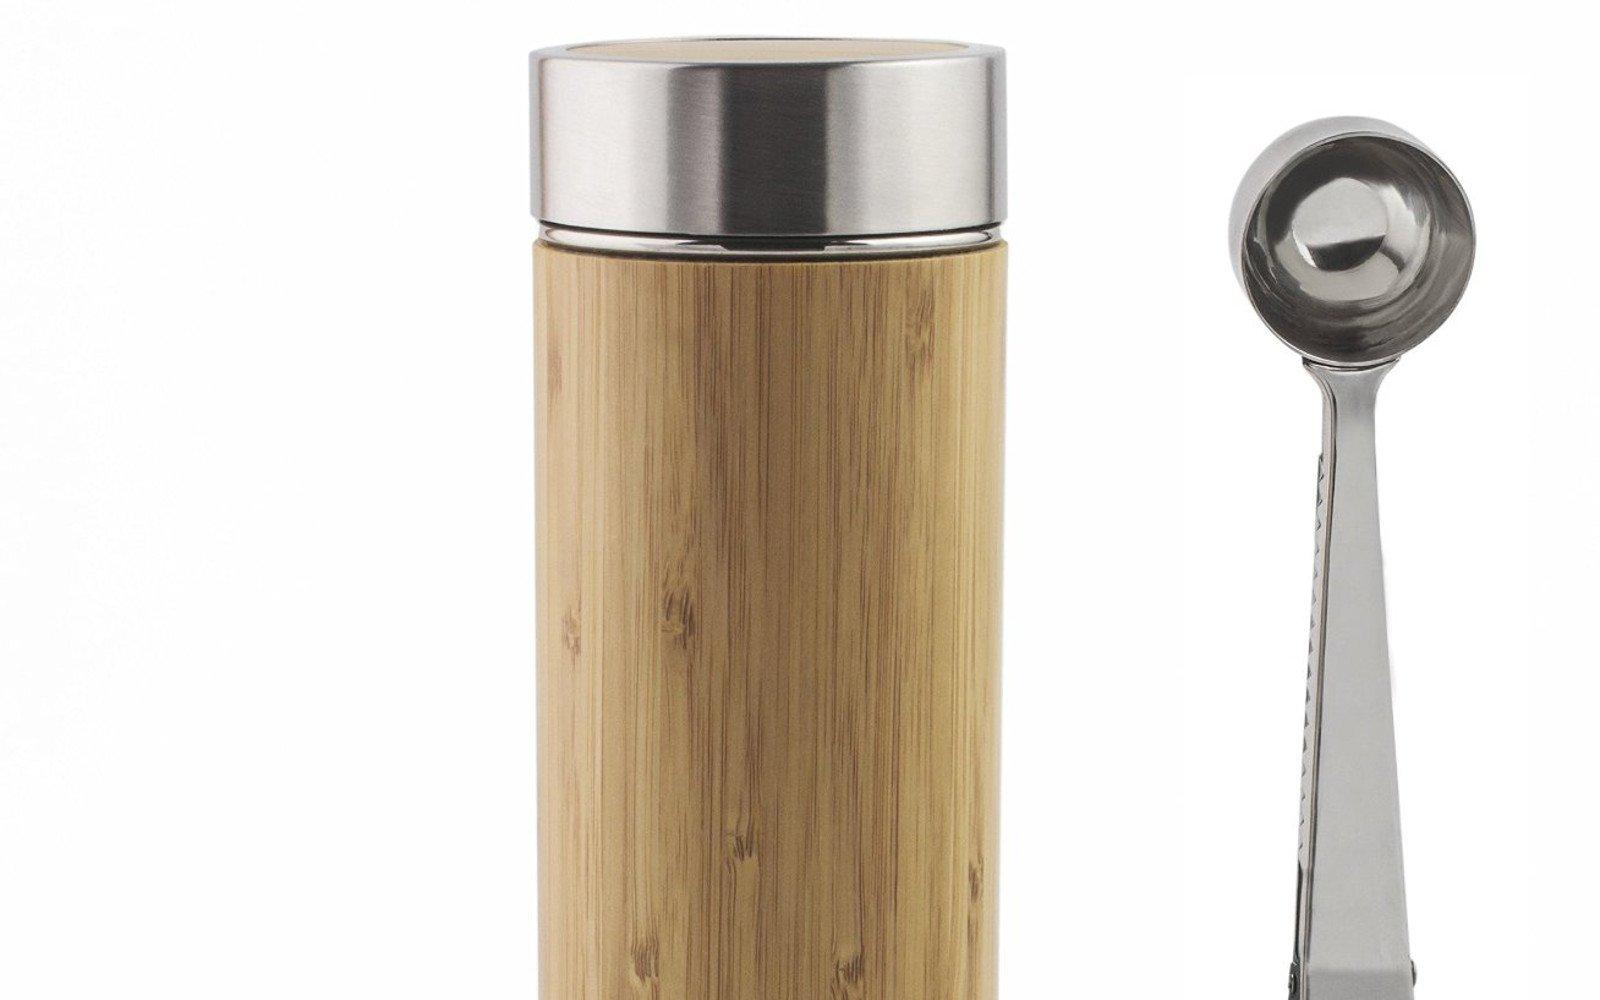 keto-coffee-bamboo-insulated-coffee-mug-and-tea-tumbler